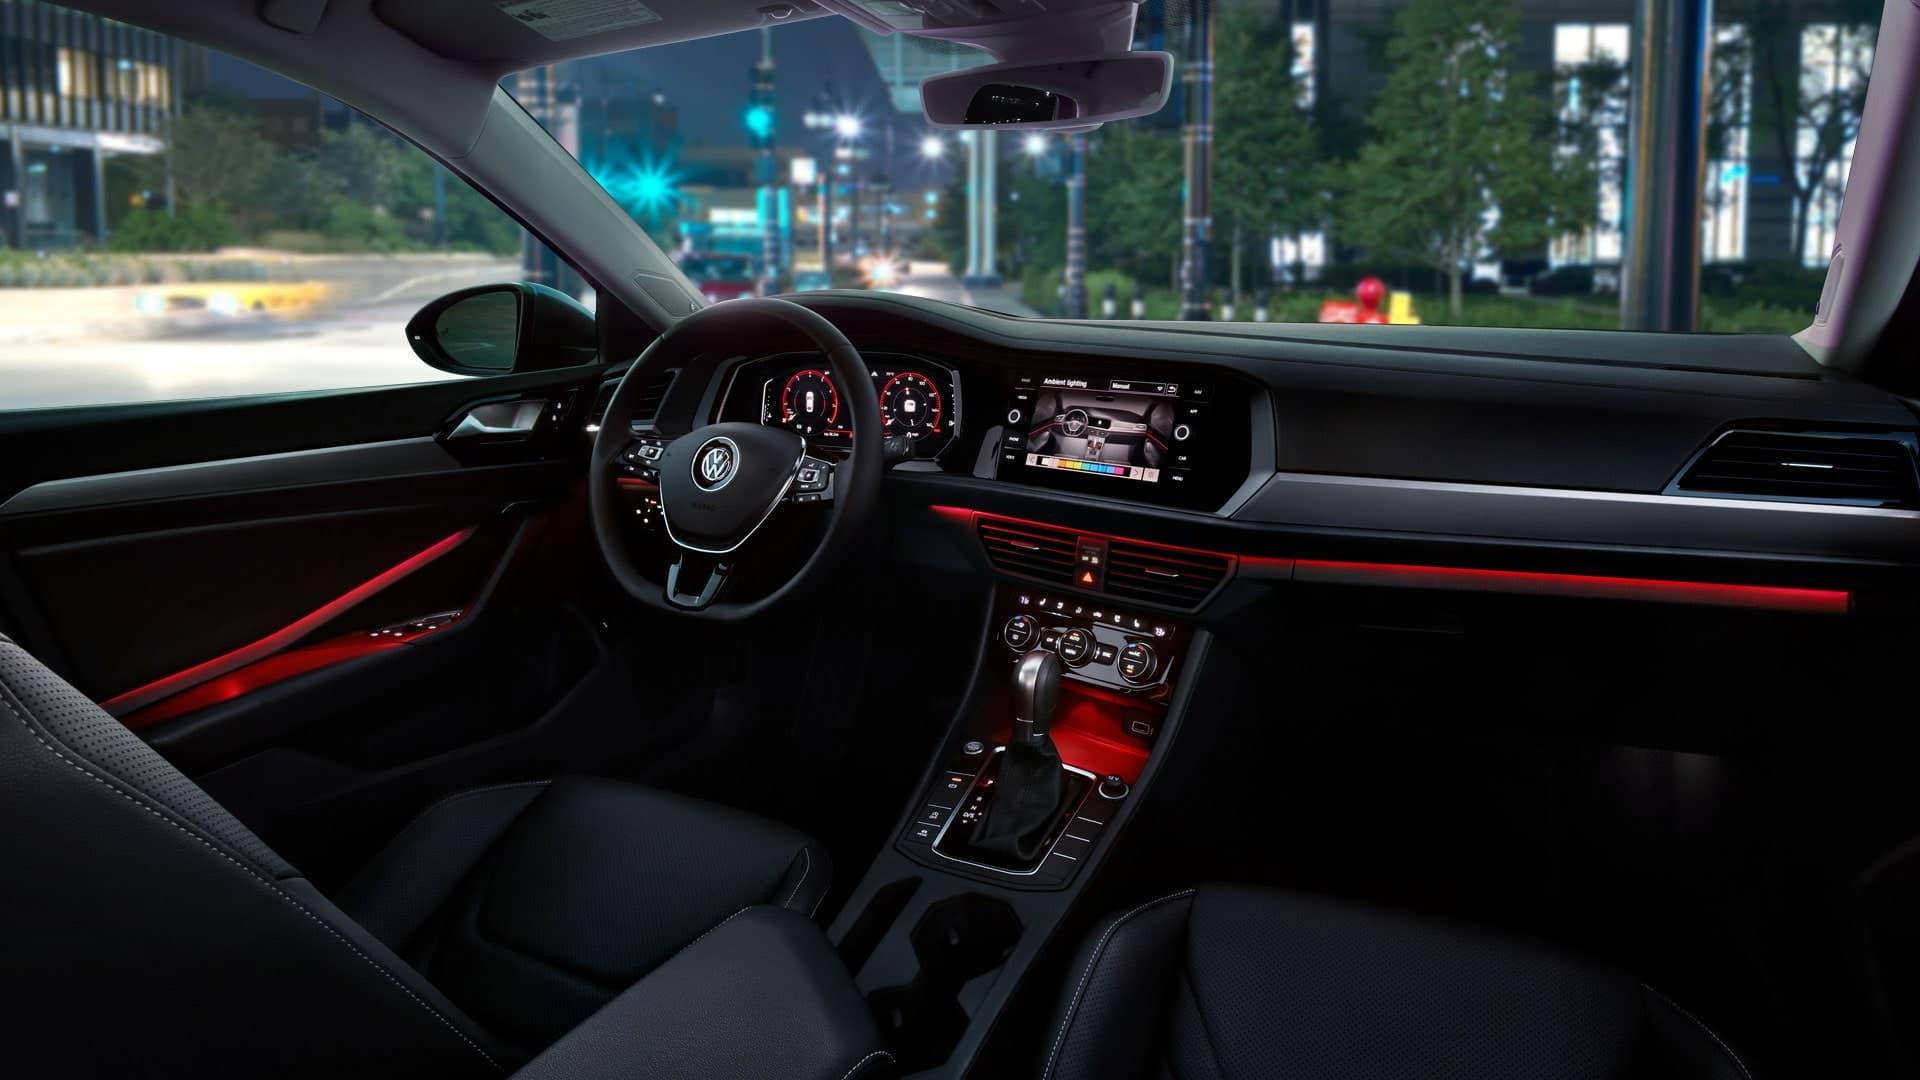 2019 VW Jetta ambient lighting